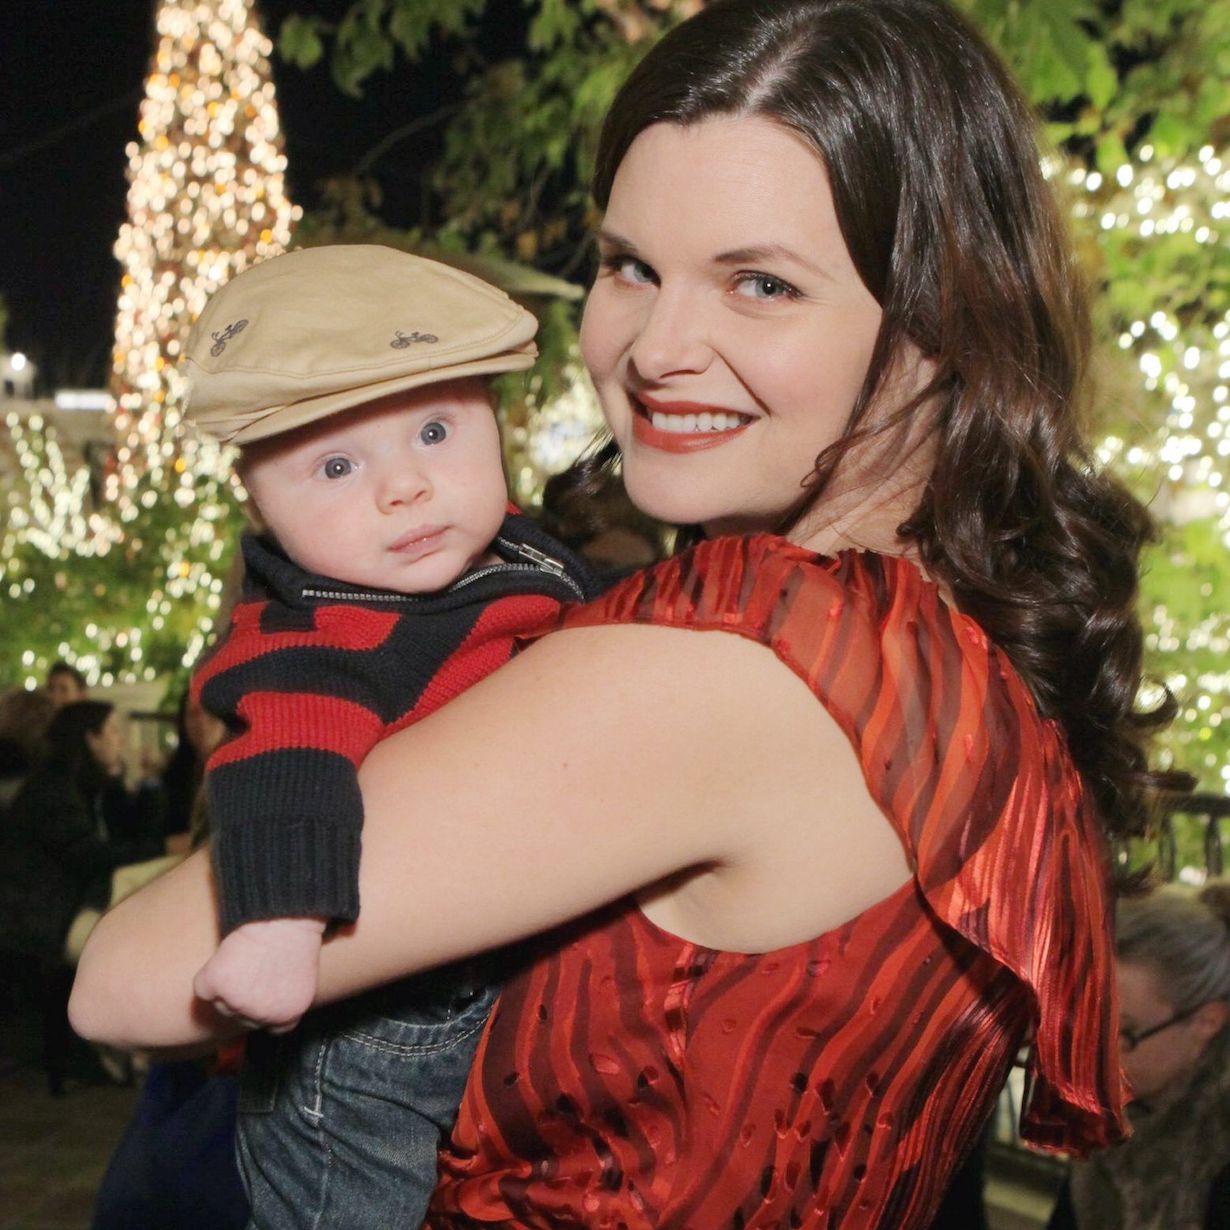 "Heather Tom, Son Zane""The Bold and the Beautiful"" 2012 Christmas PartyThe GroveLos Angeles12/19/12© Howard Wise/jpistudios.com310-657-9661"